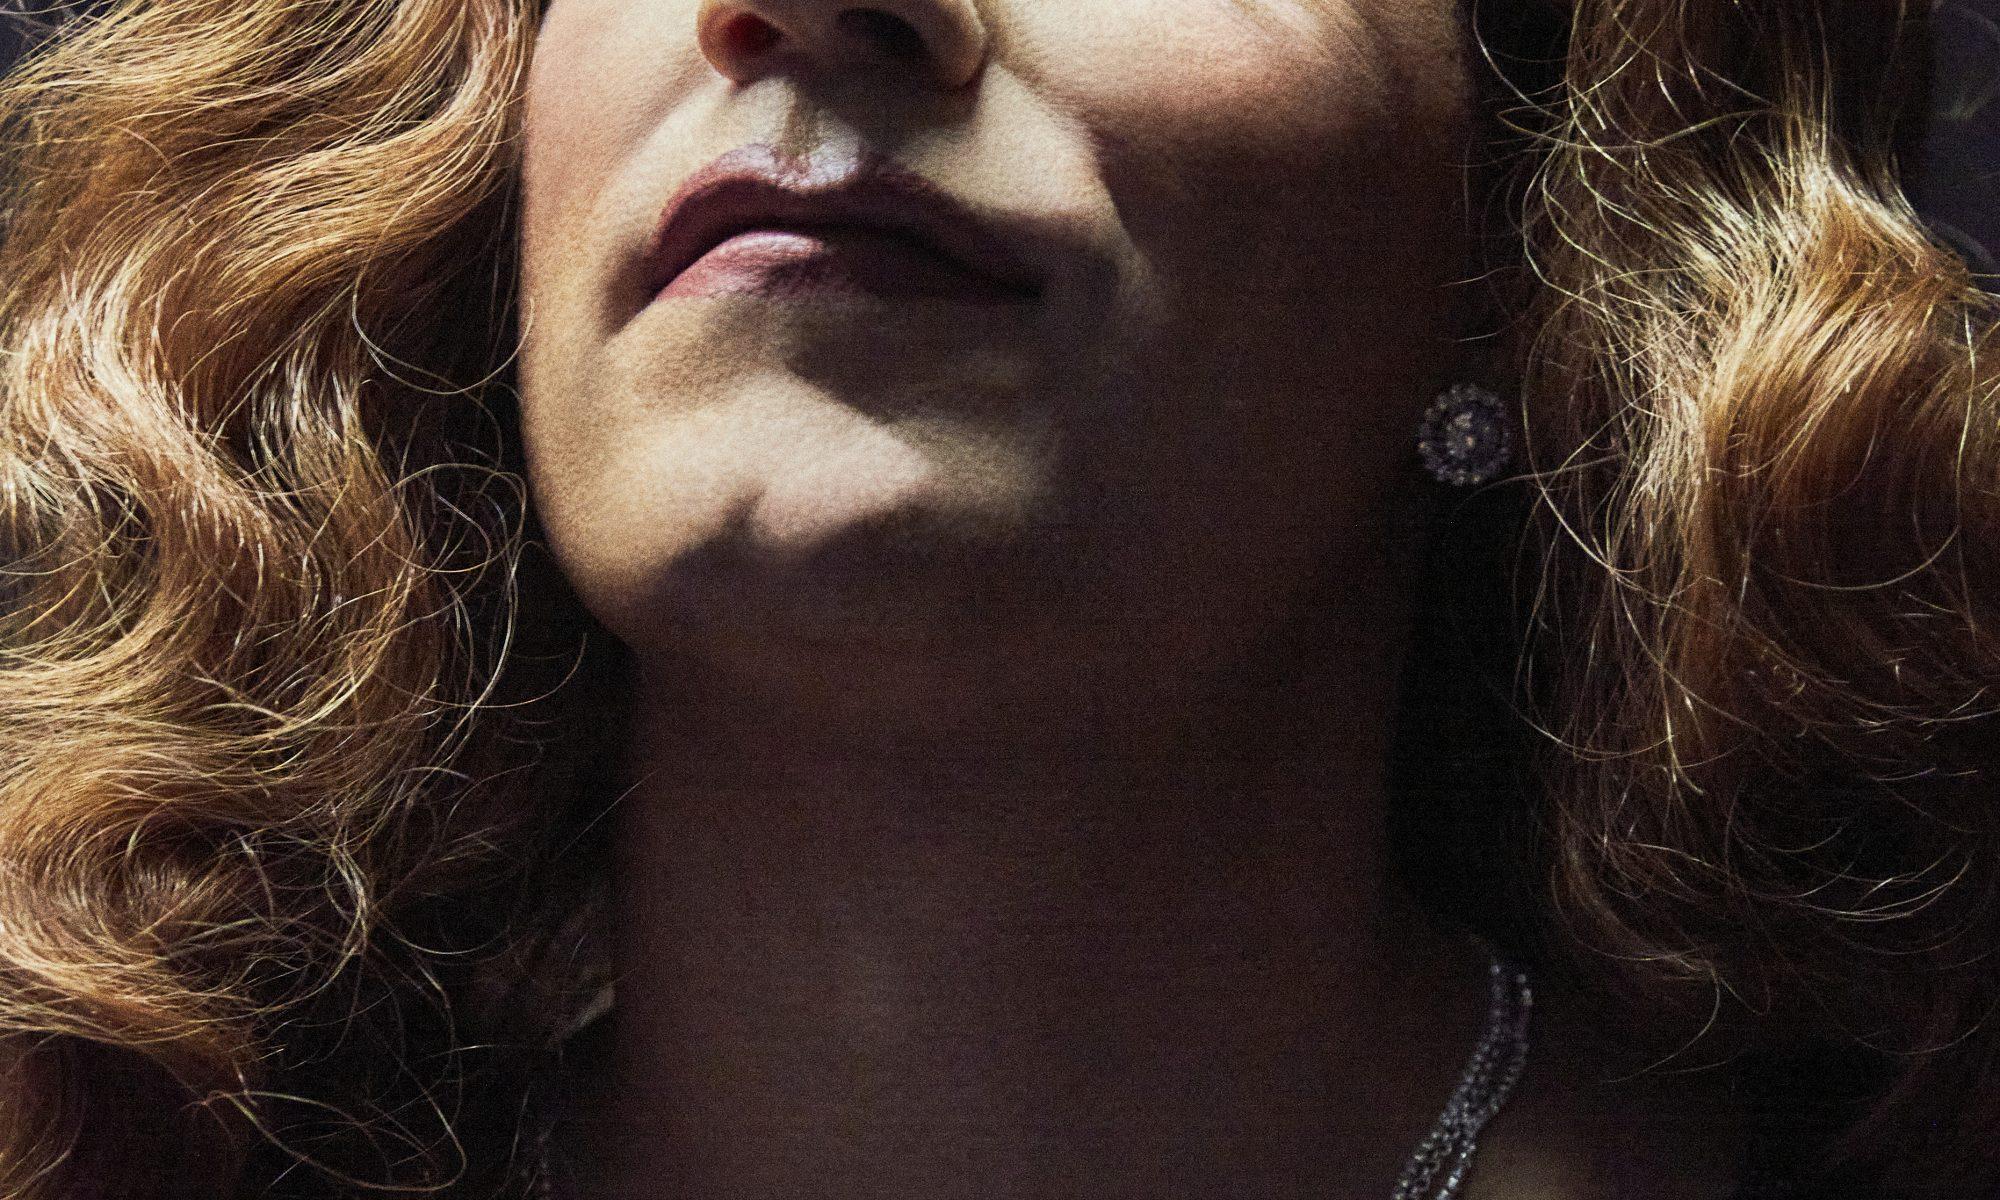 "Neues Musikvideo ""Ungeschminkt"": Johannes Oerding wird zur Frau"